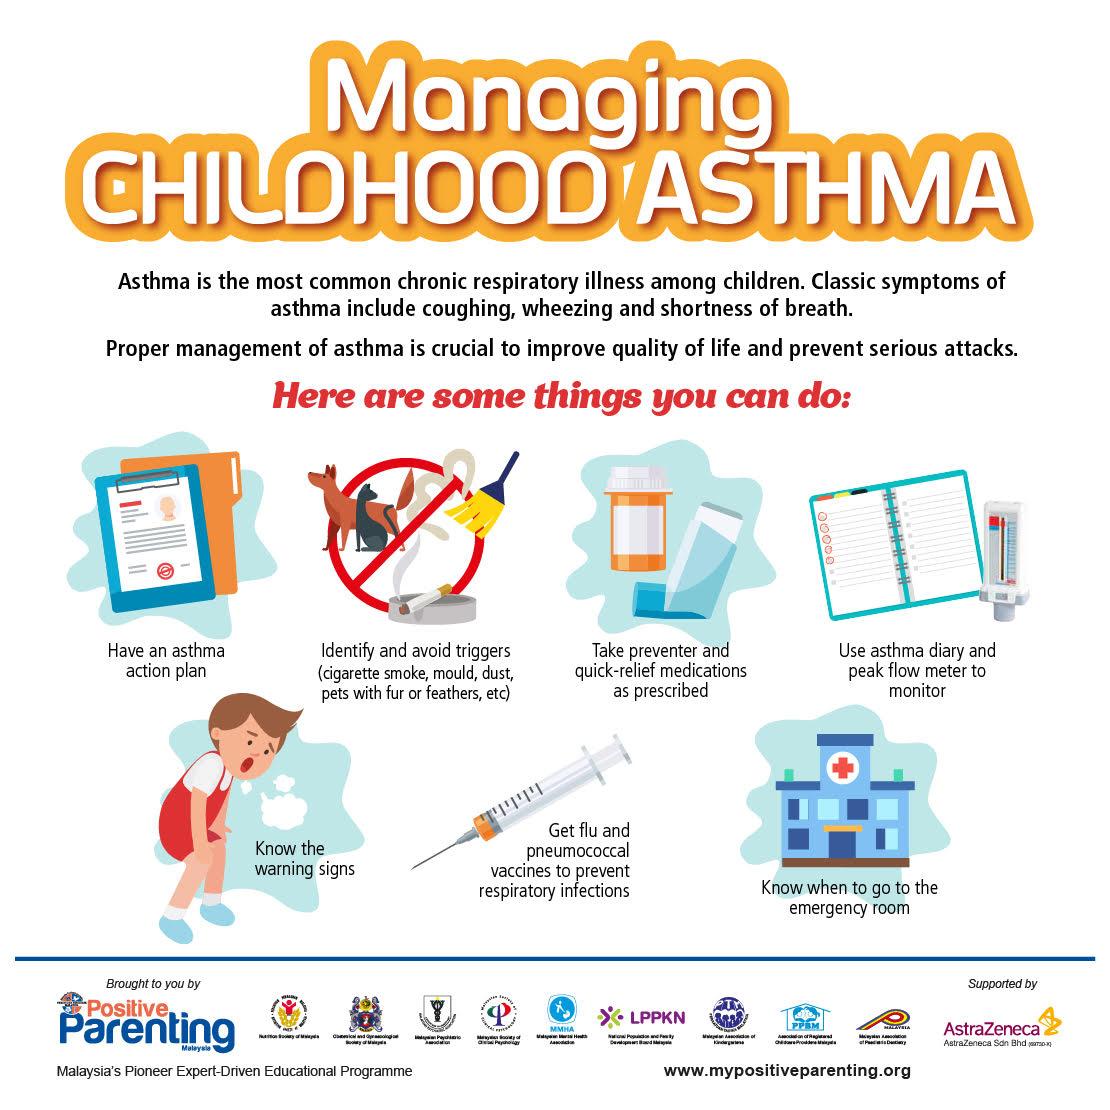 Managing Childhood Asthma - Positive Parenting